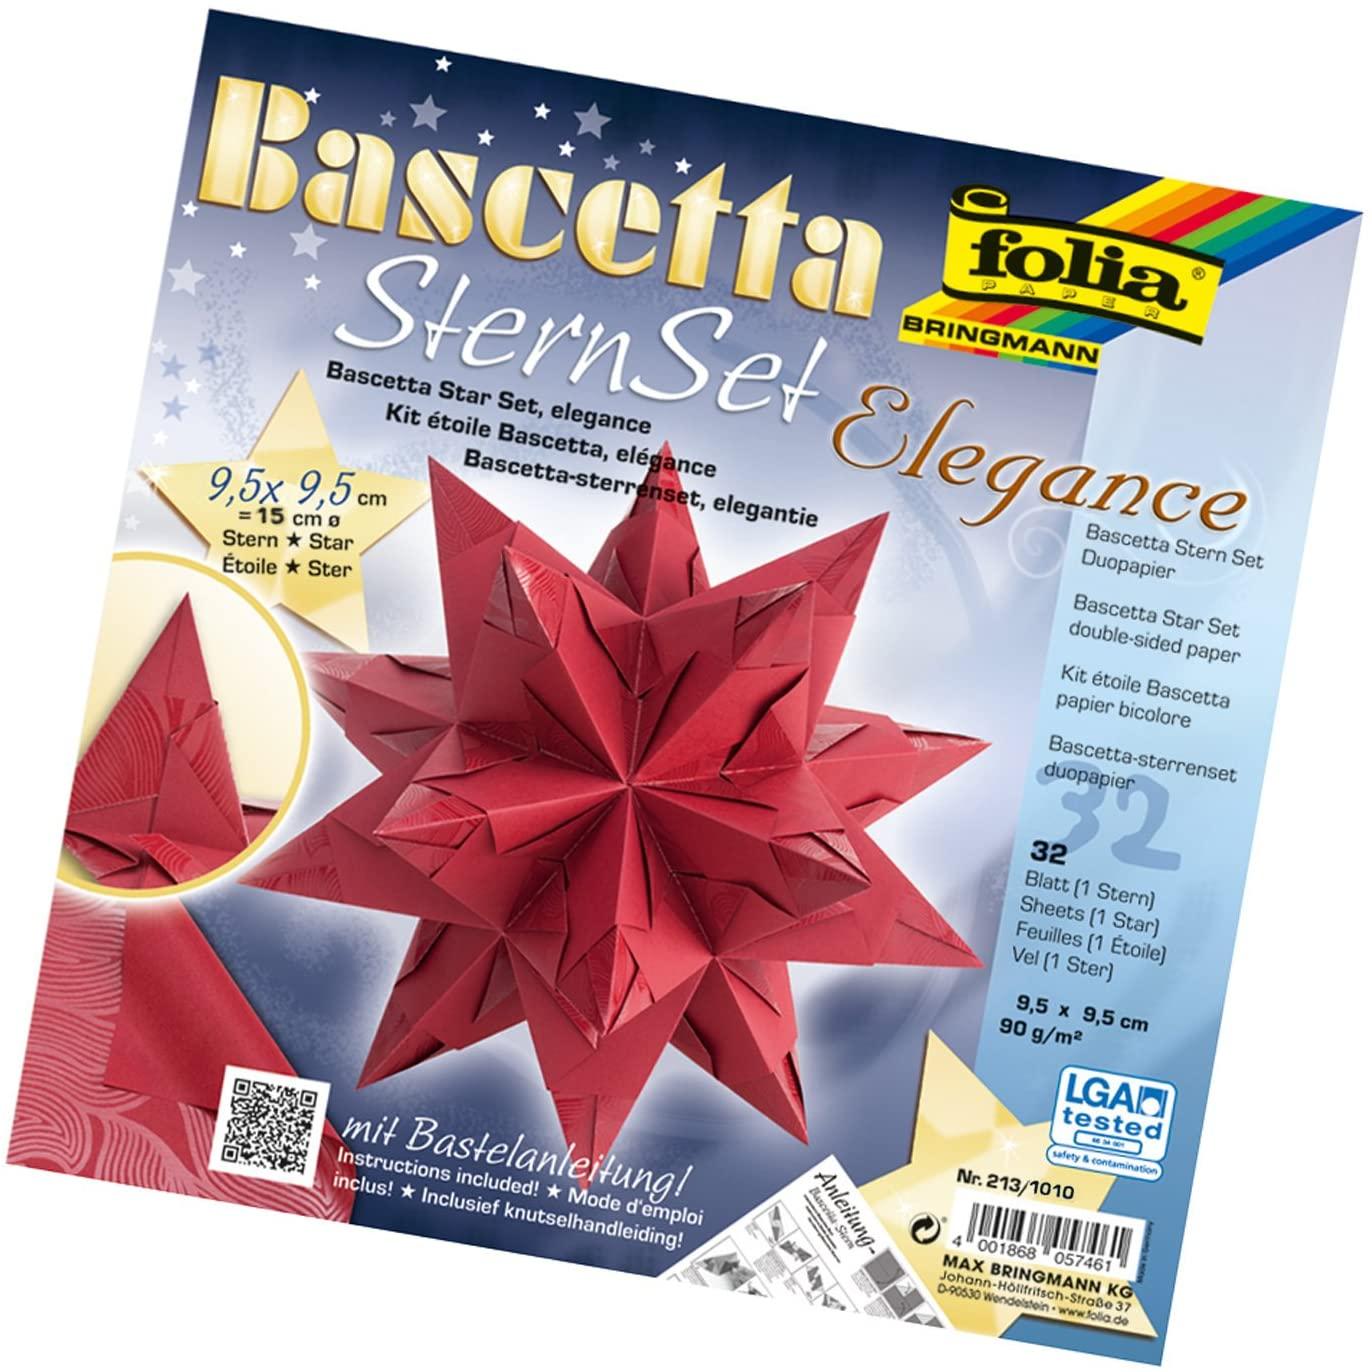 Folia 836/3030Bascetta Star Handicraft Set, Blue, Card, red, 9,5 x 9,5 cm